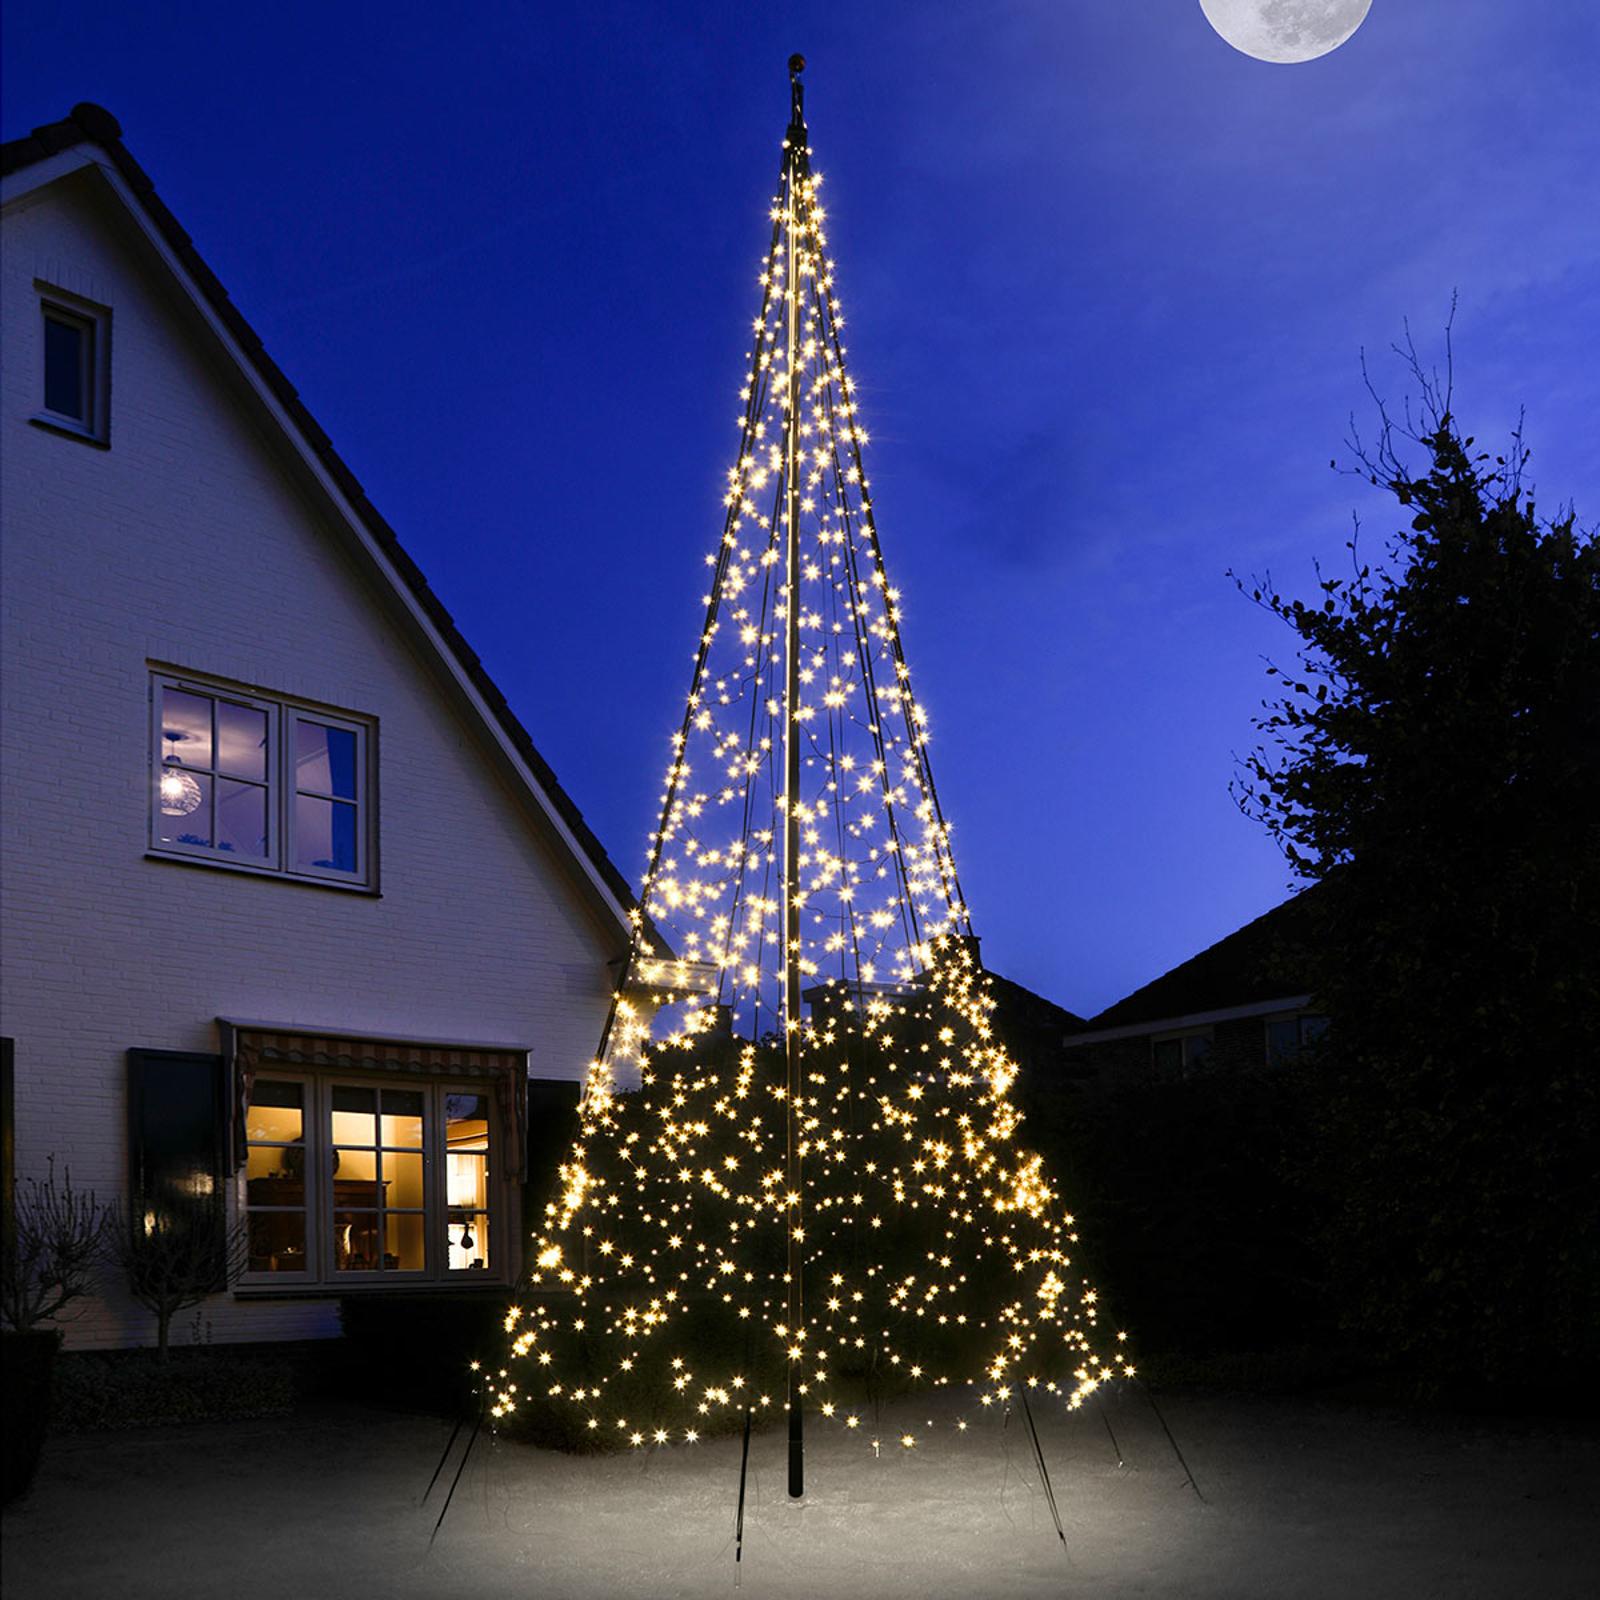 Fairybell® choinka, 6m, 1200 migających diod LED